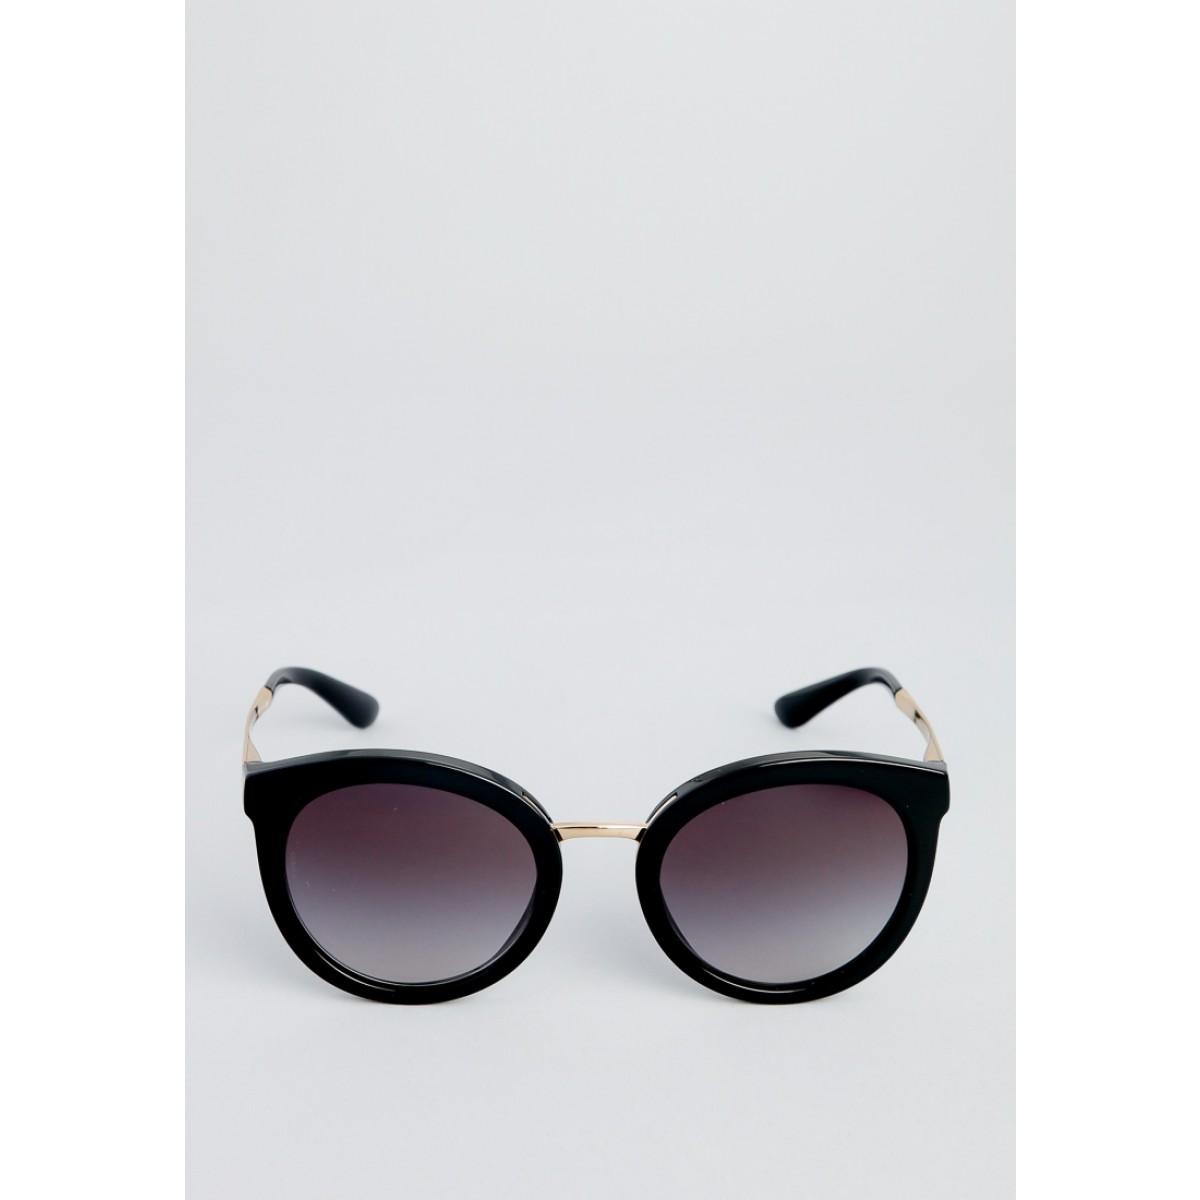 d7925747c805c0 ... Dolce   Gabbana Black Gold Oval Women Sunglasses Dg4268 601 8g 52